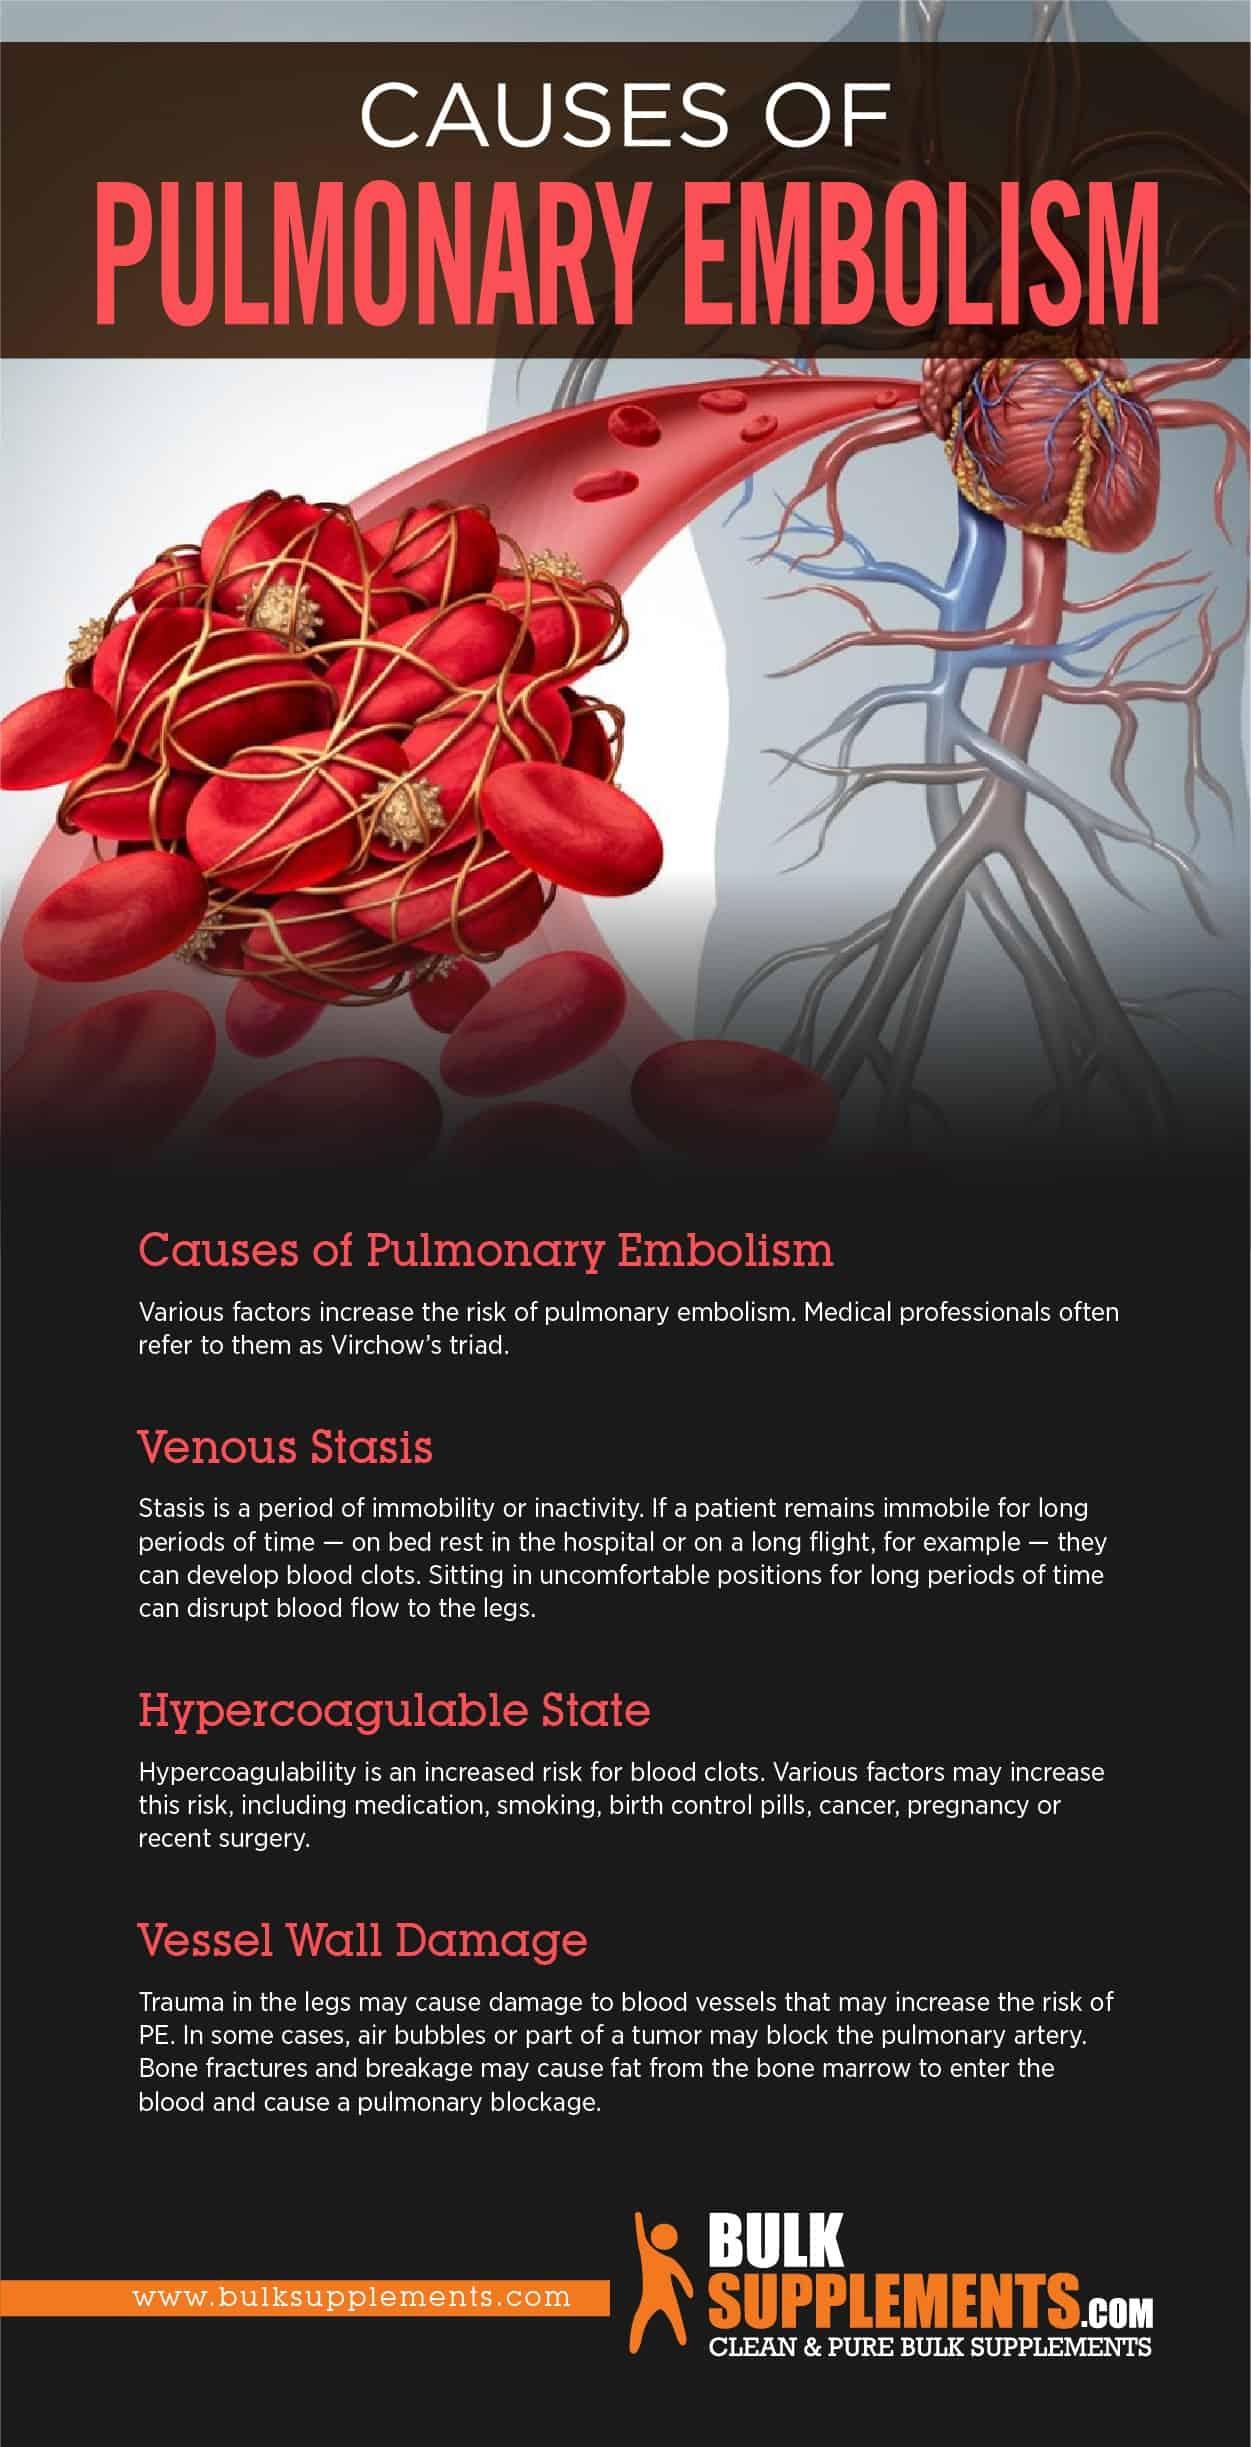 Causes of Pulmonary Embolism